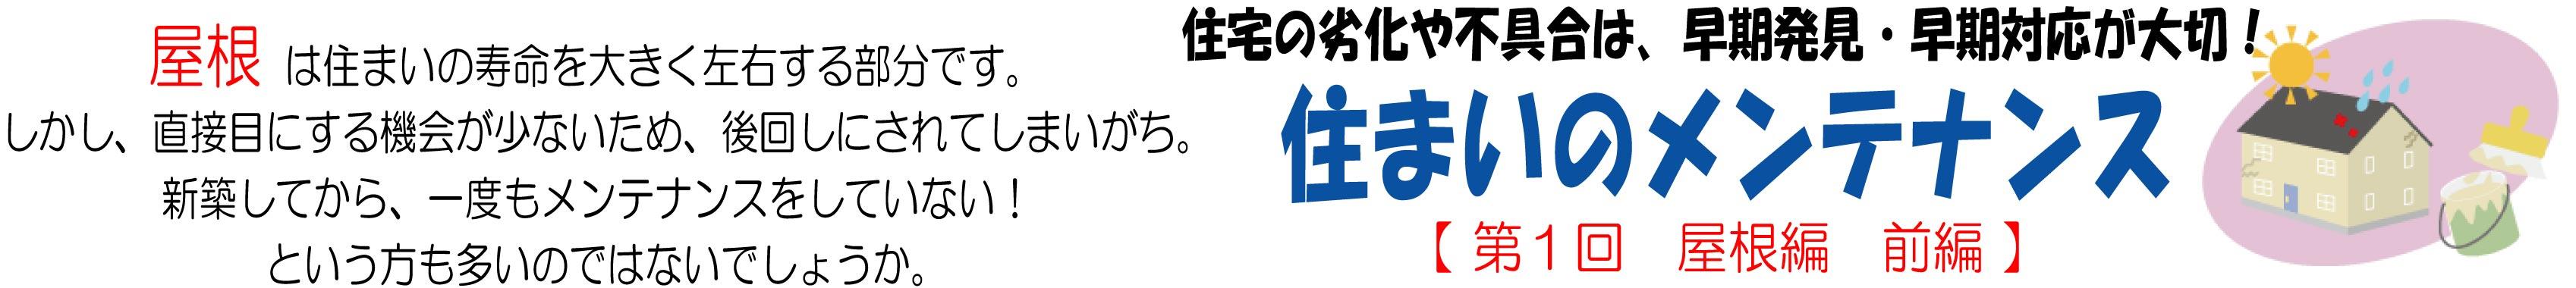 KuraSi-natu-sin80-08.jpg